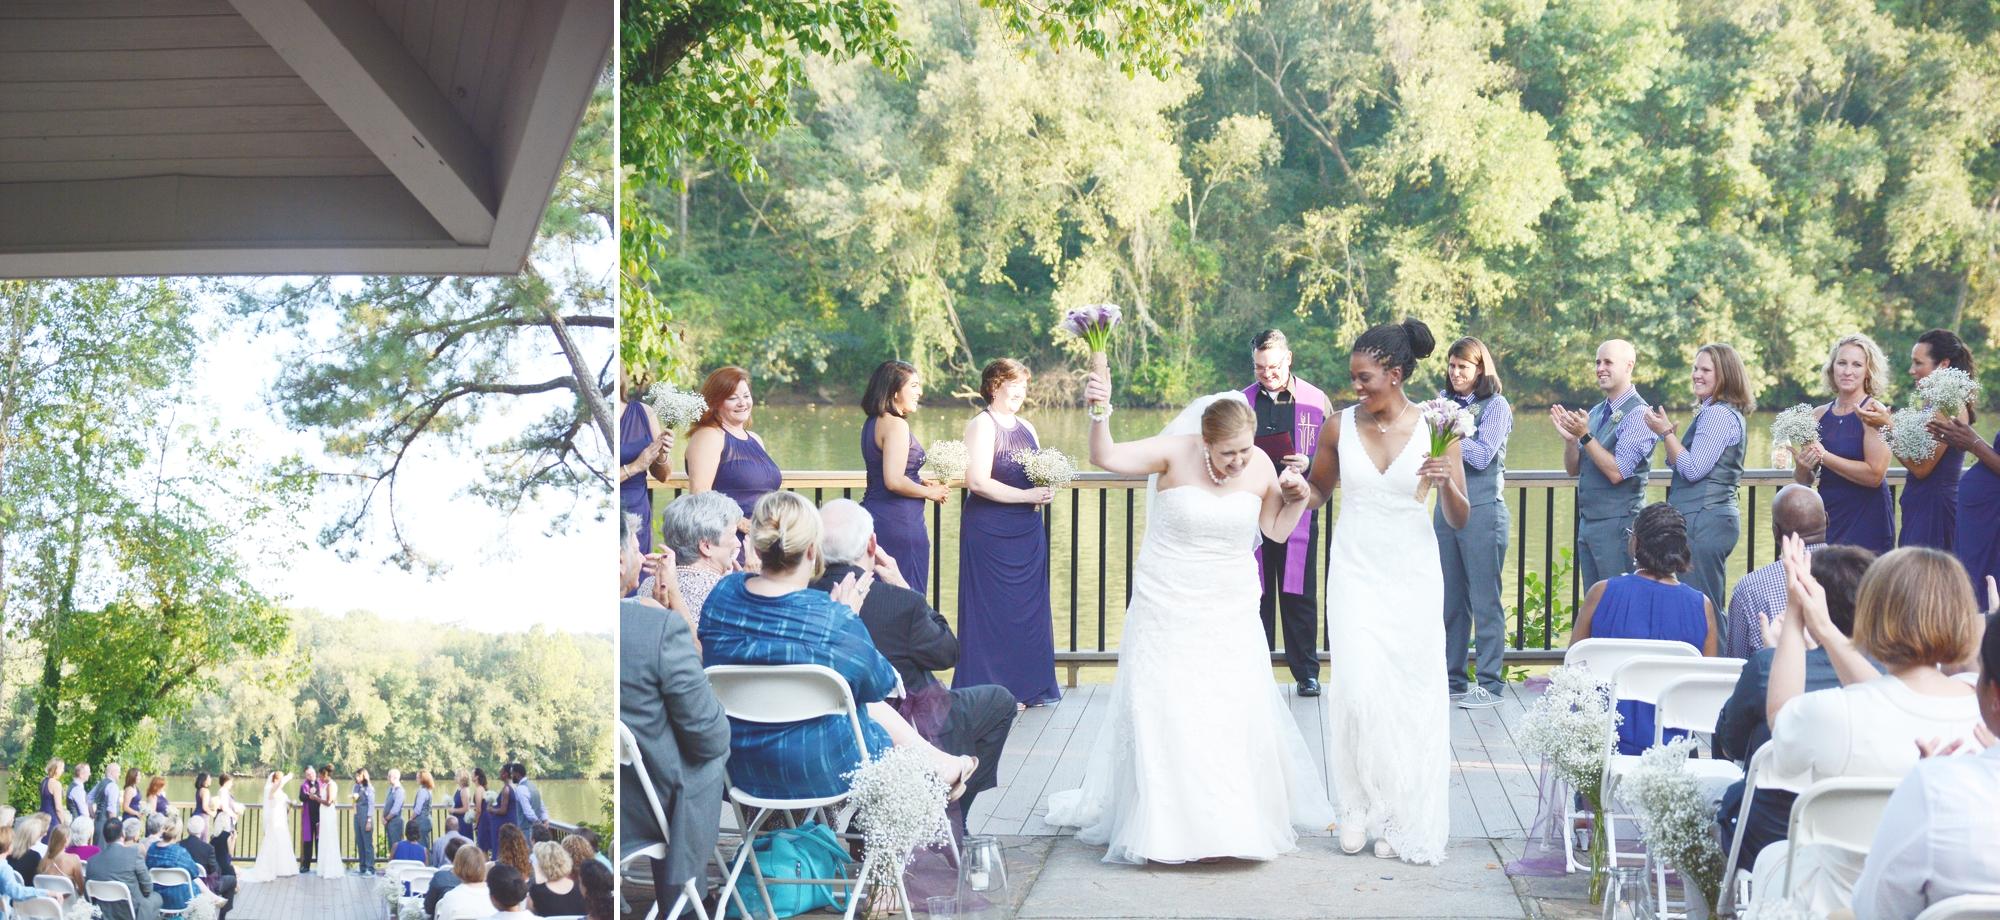 interracial-same-sex-wedding-six-hearts-photography-38